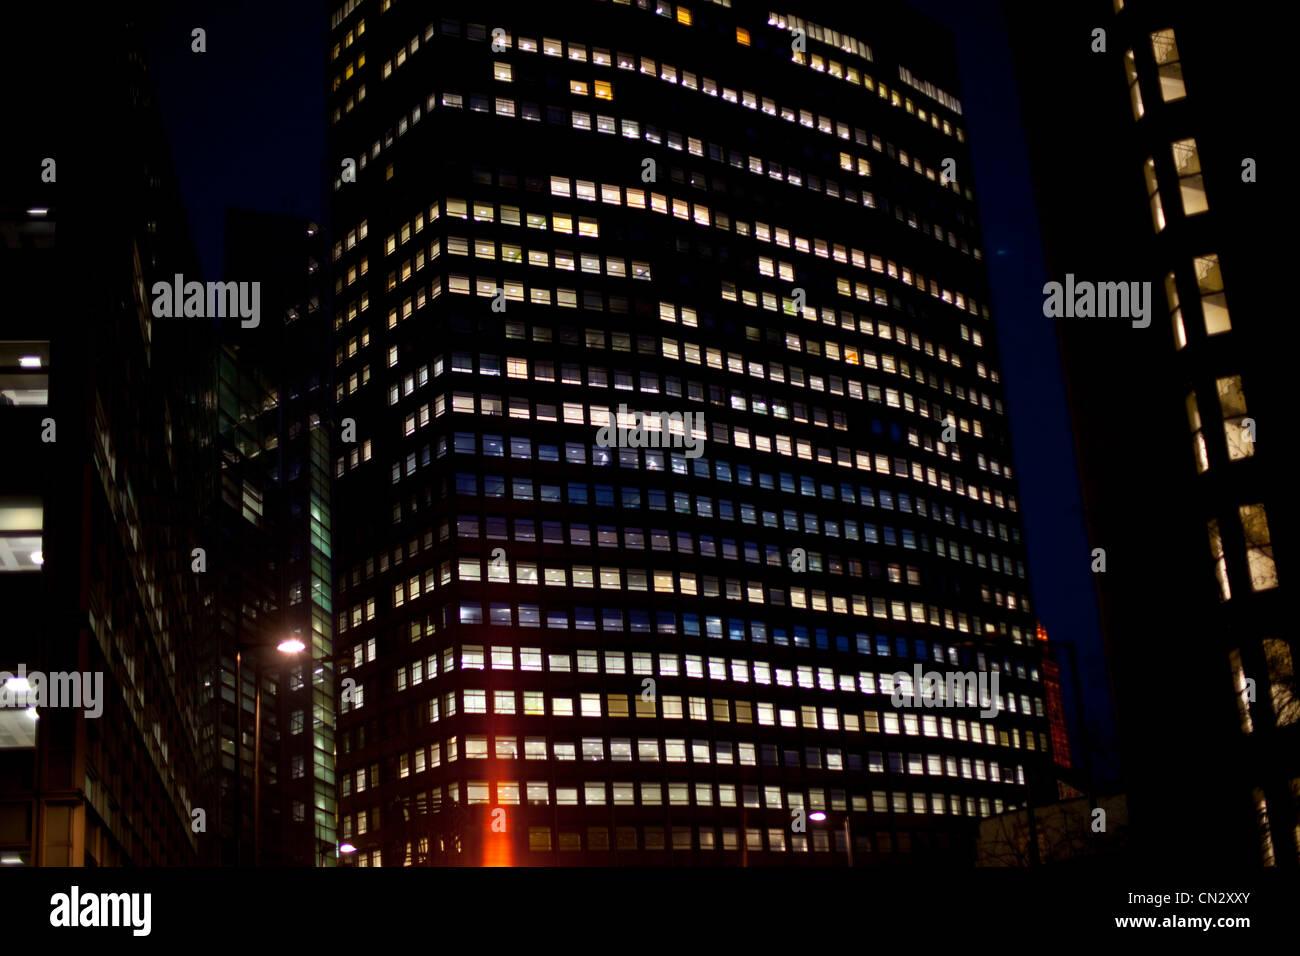 Skyscraper at night, London, England - Stock Image